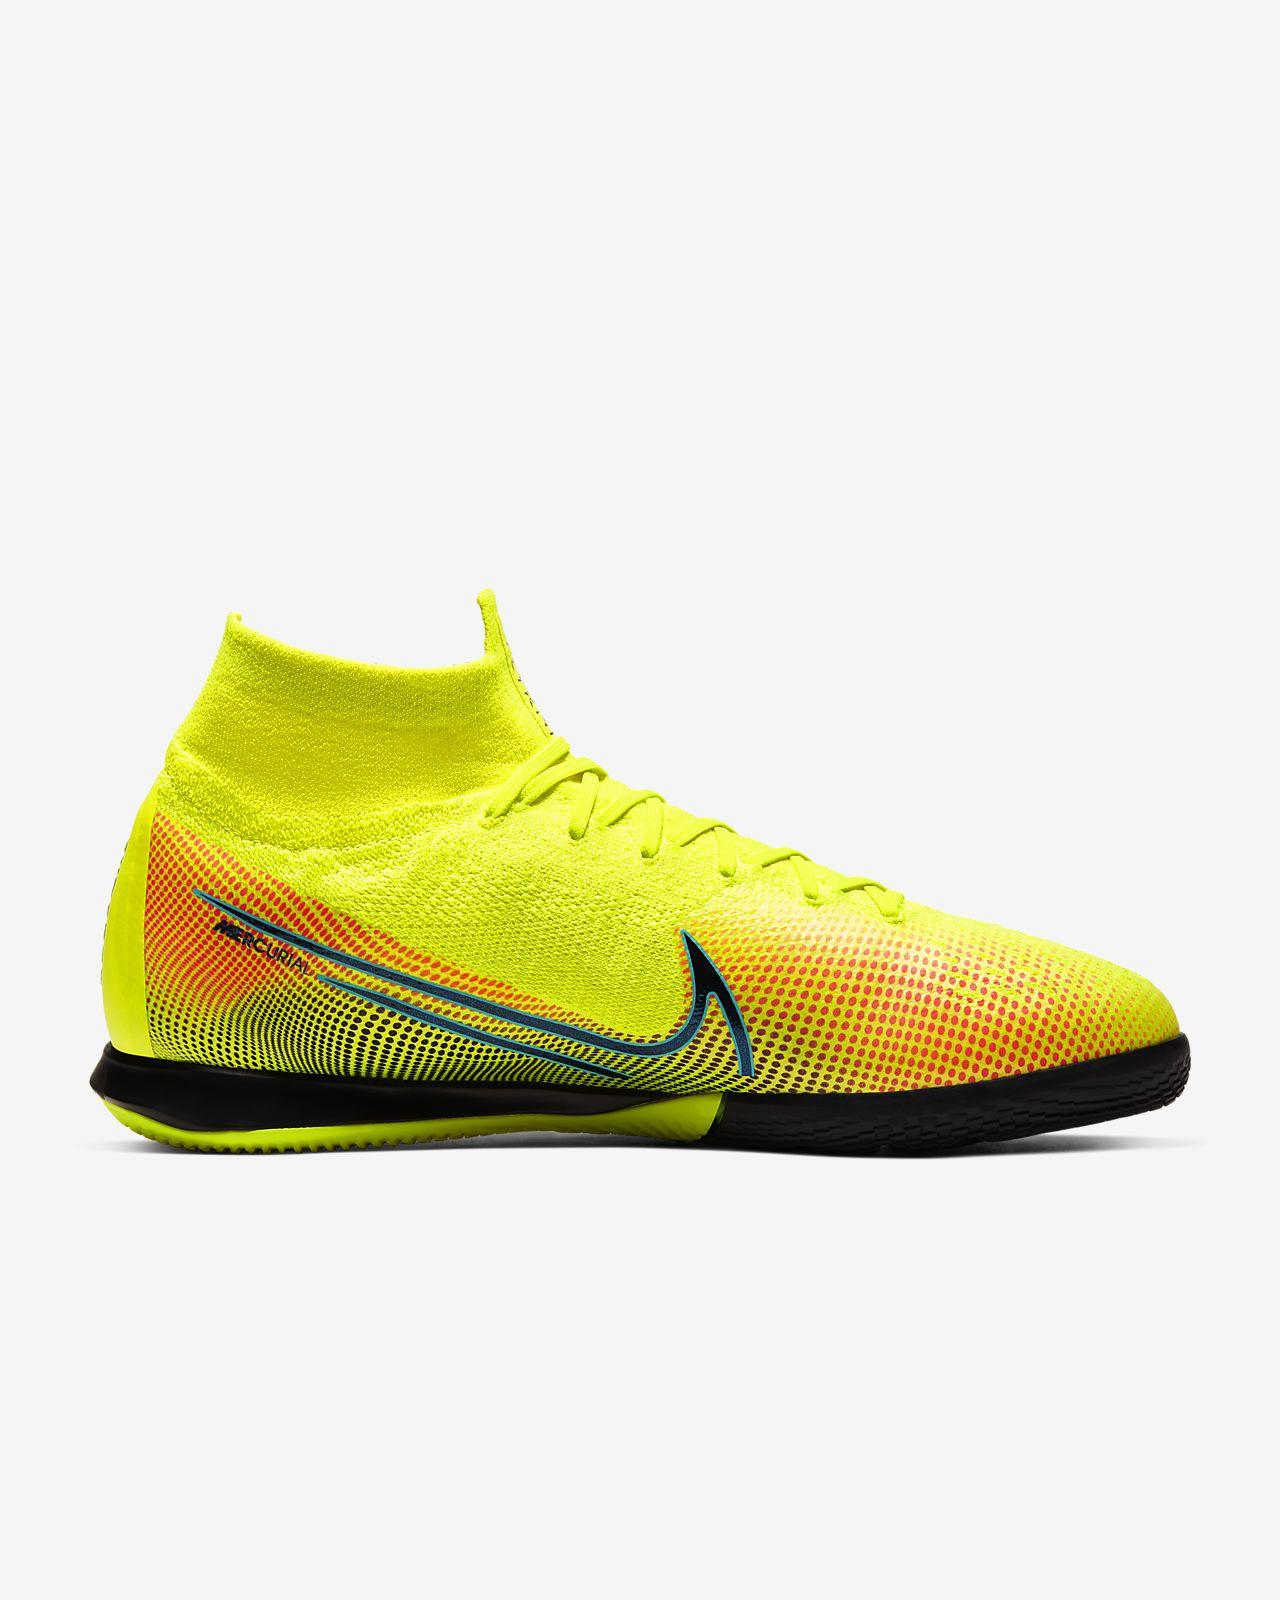 chaussure nike mercurial superfly futsal